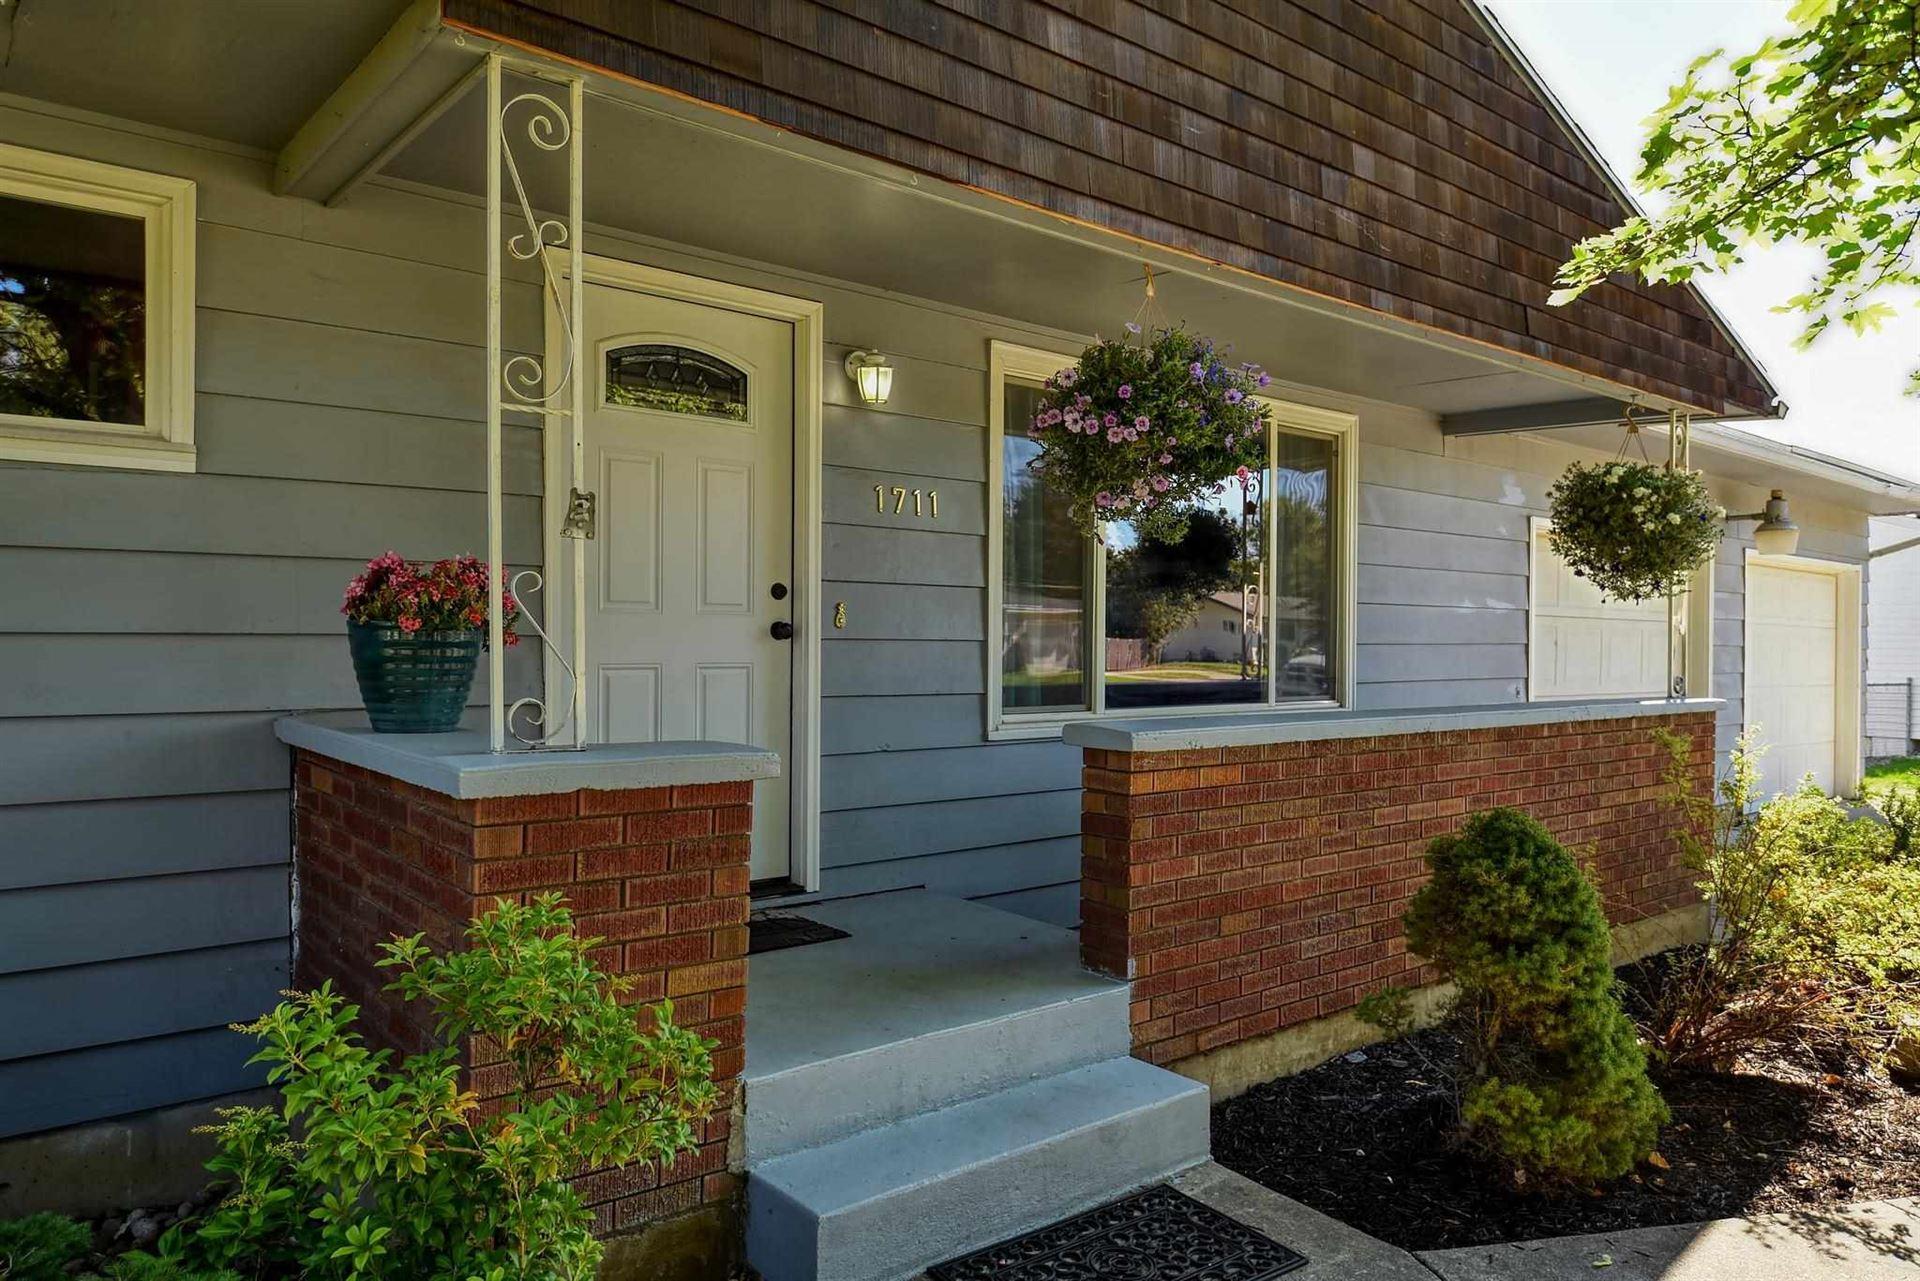 1711 S Bolivar Rd, Spokane Valley, WA 99037 - #: 202122928